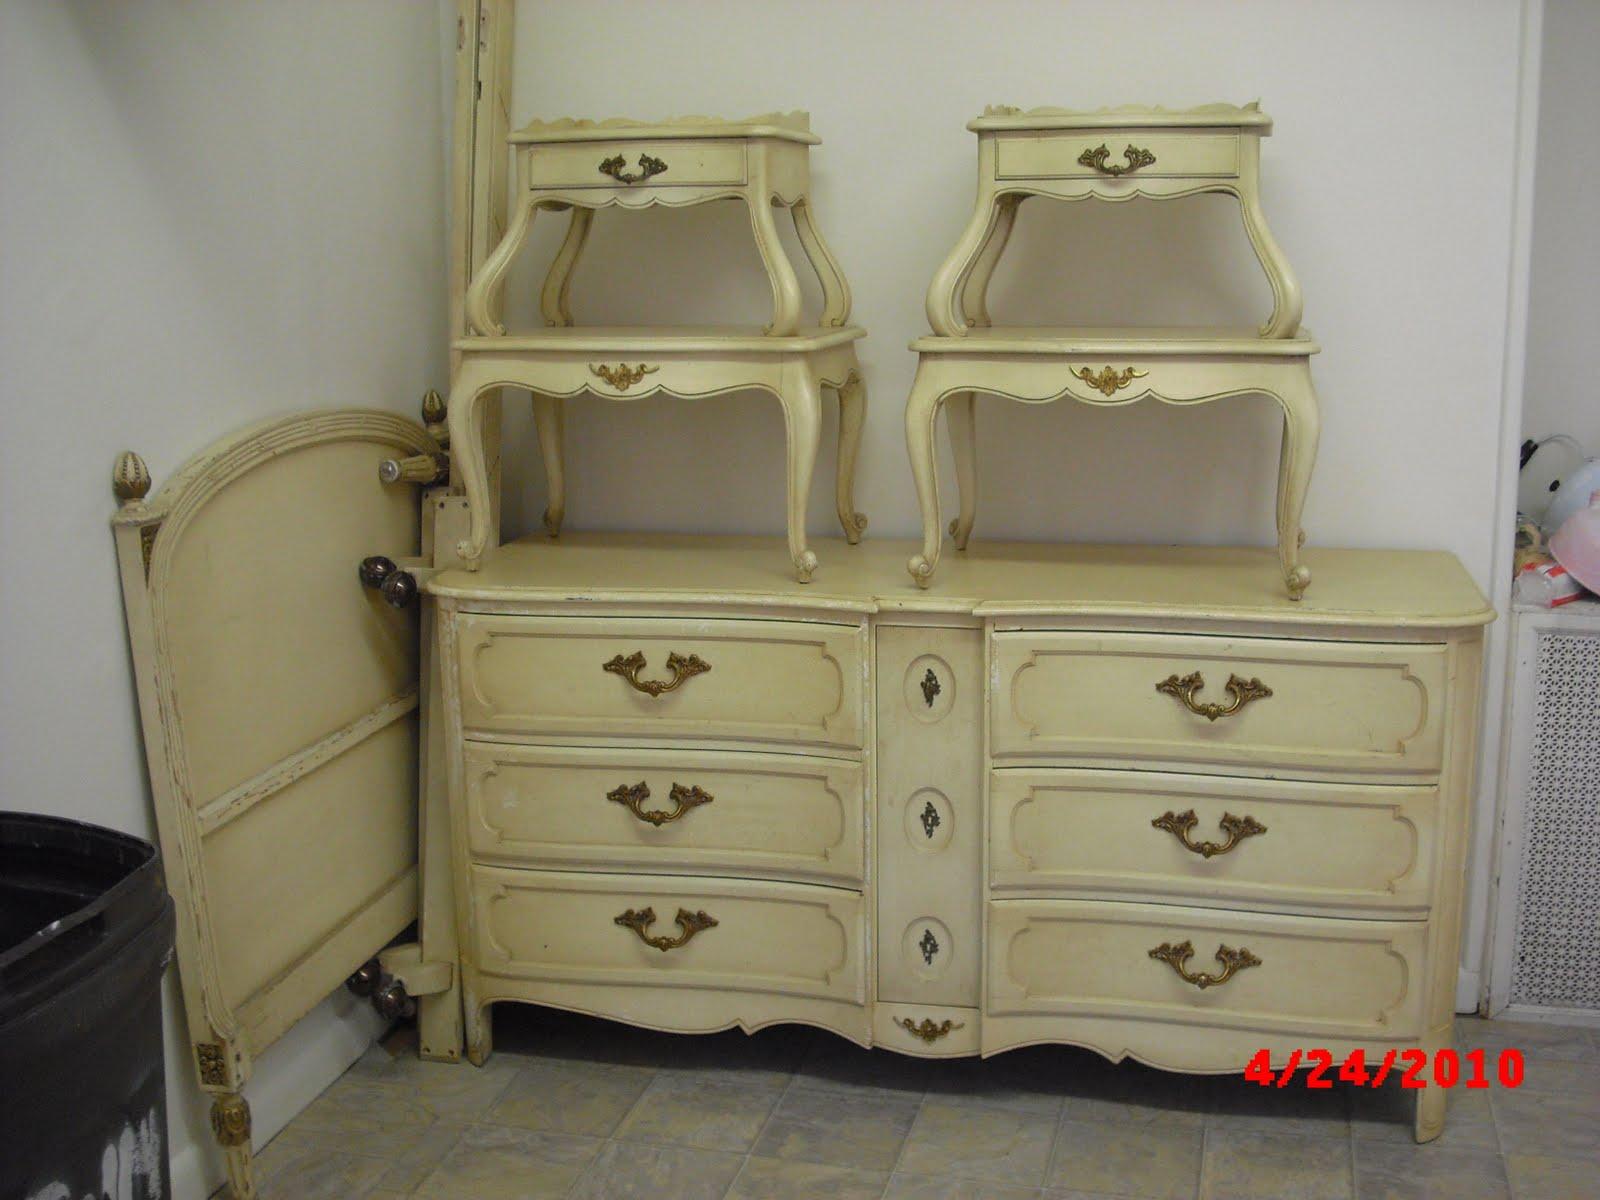 Sears Bedroom Furniture | Bedroom Furniture High Resolution